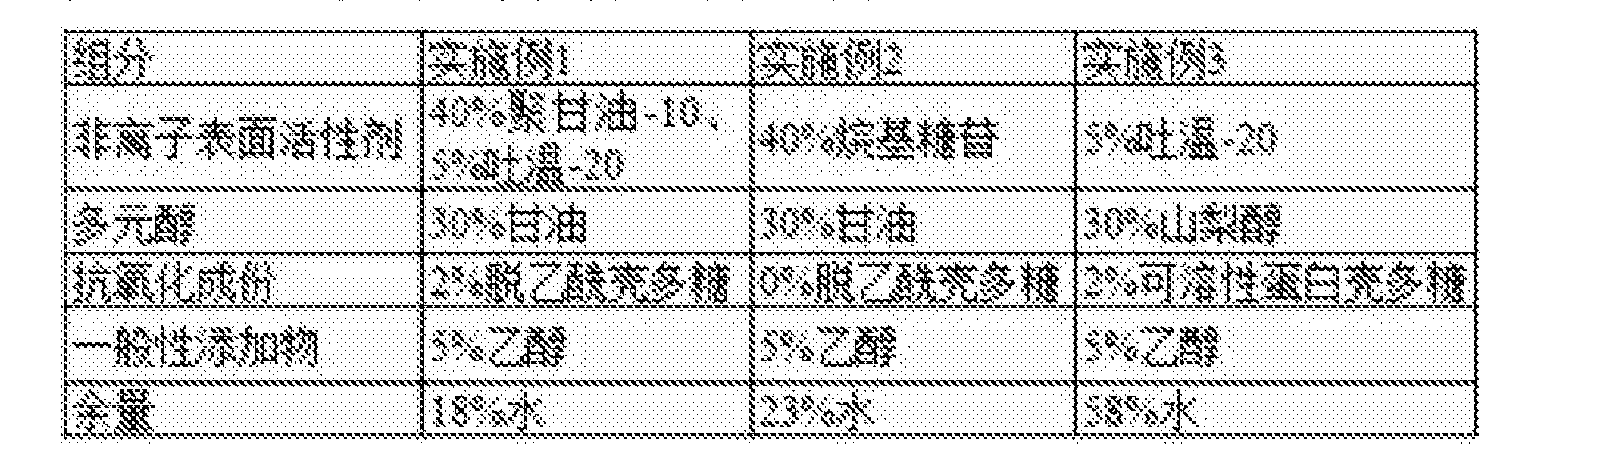 Figure CN106520392AD00041